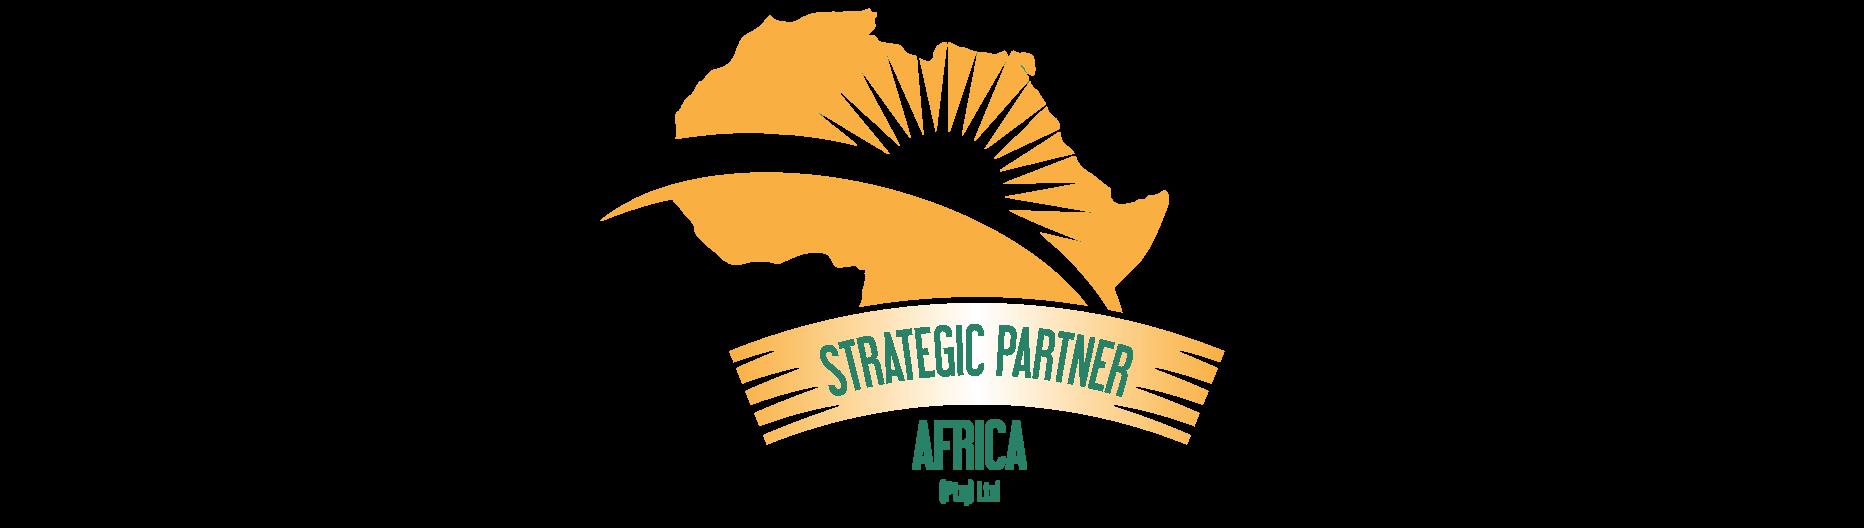 Strategic Partner Africa